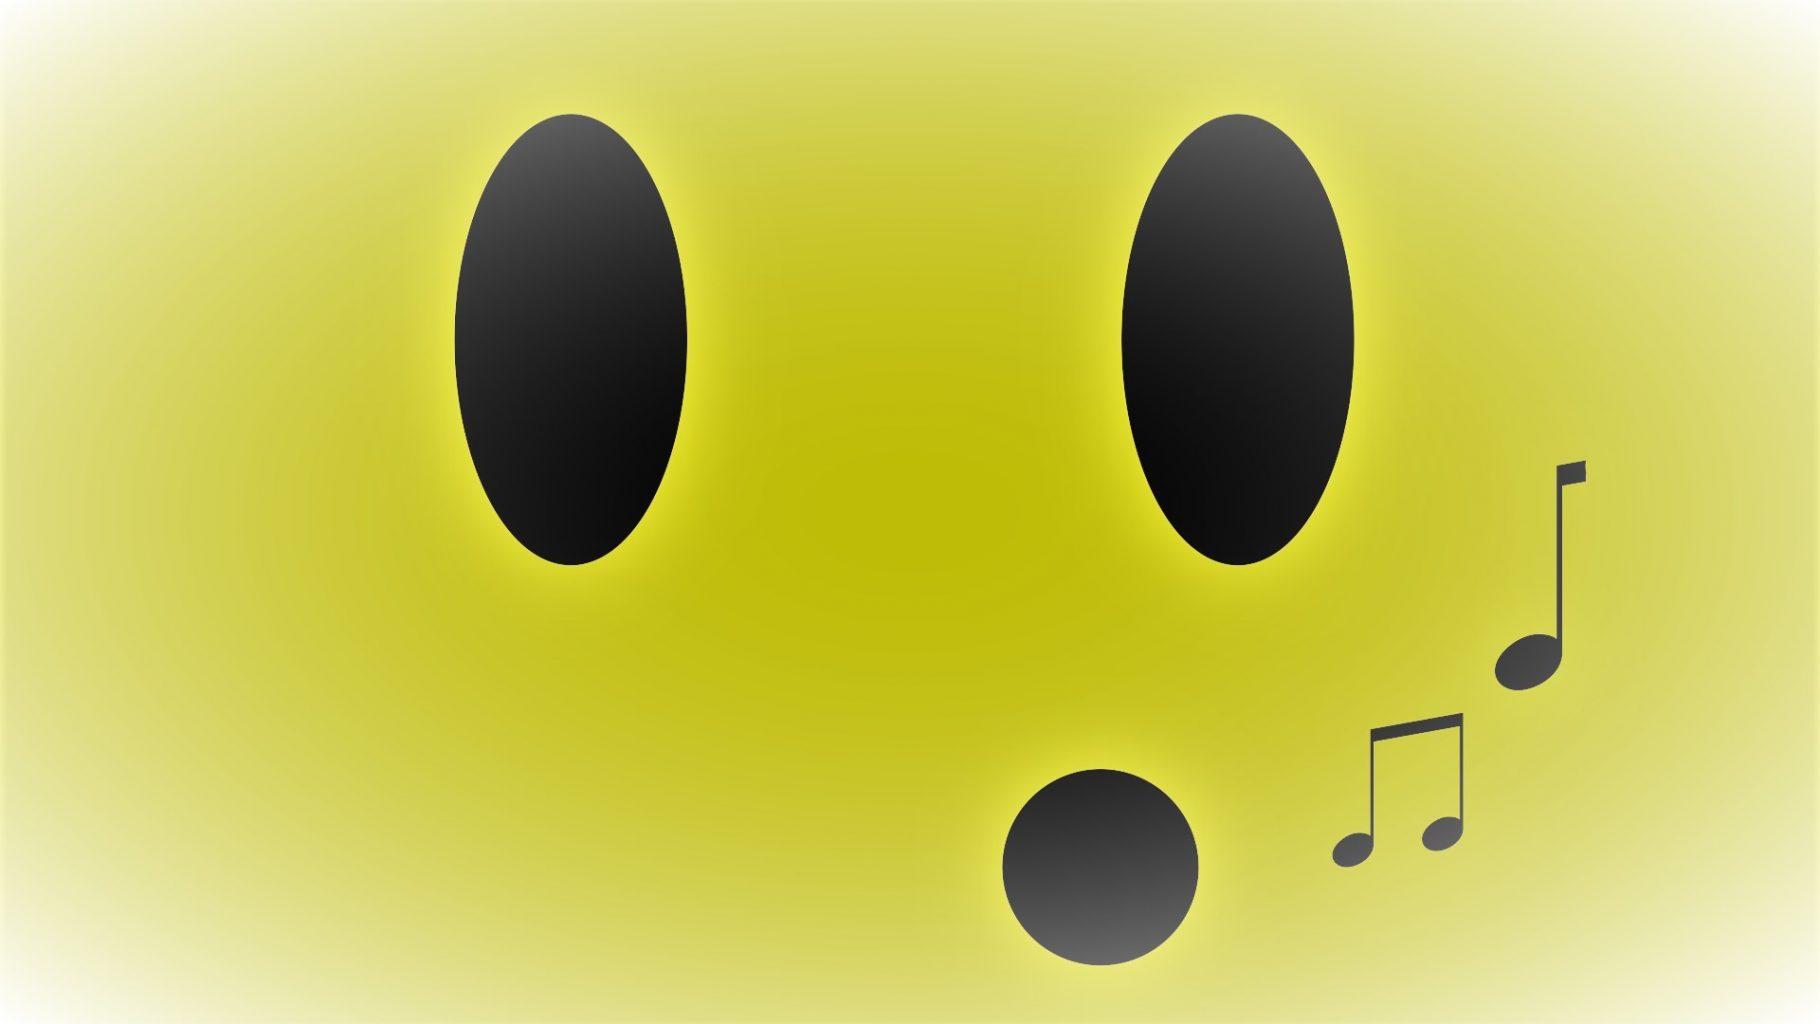 Image: Whistling emoji